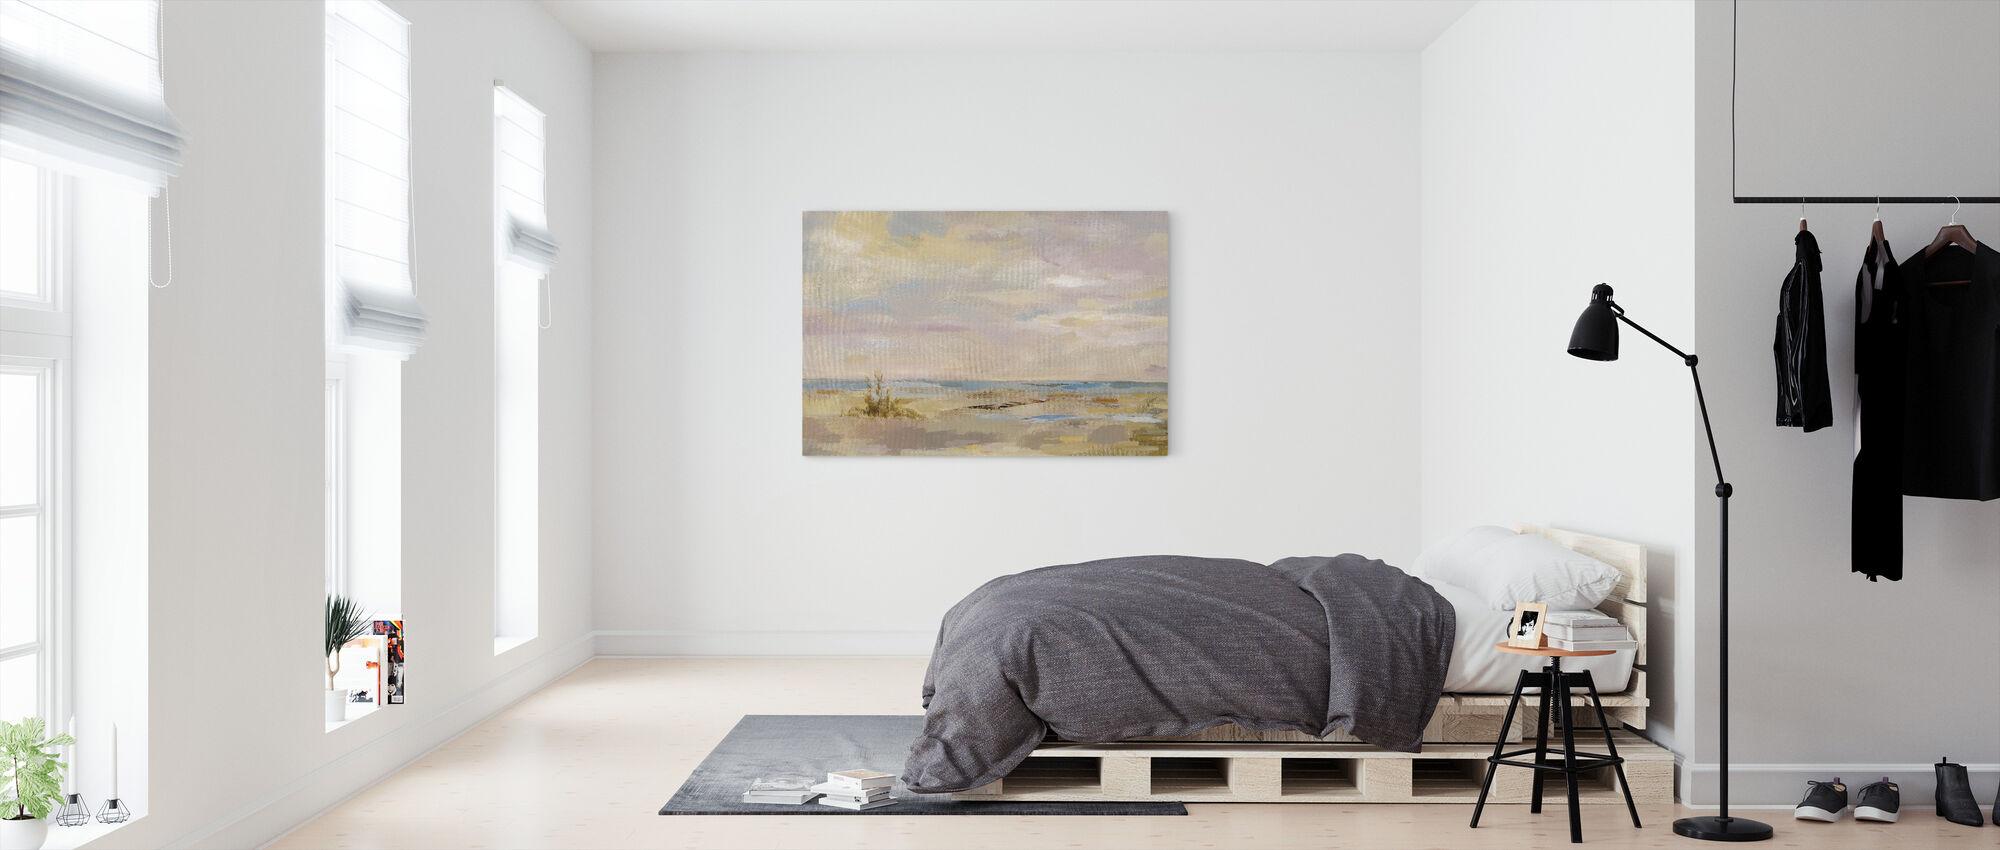 Dreamy Beach - Canvas print - Bedroom